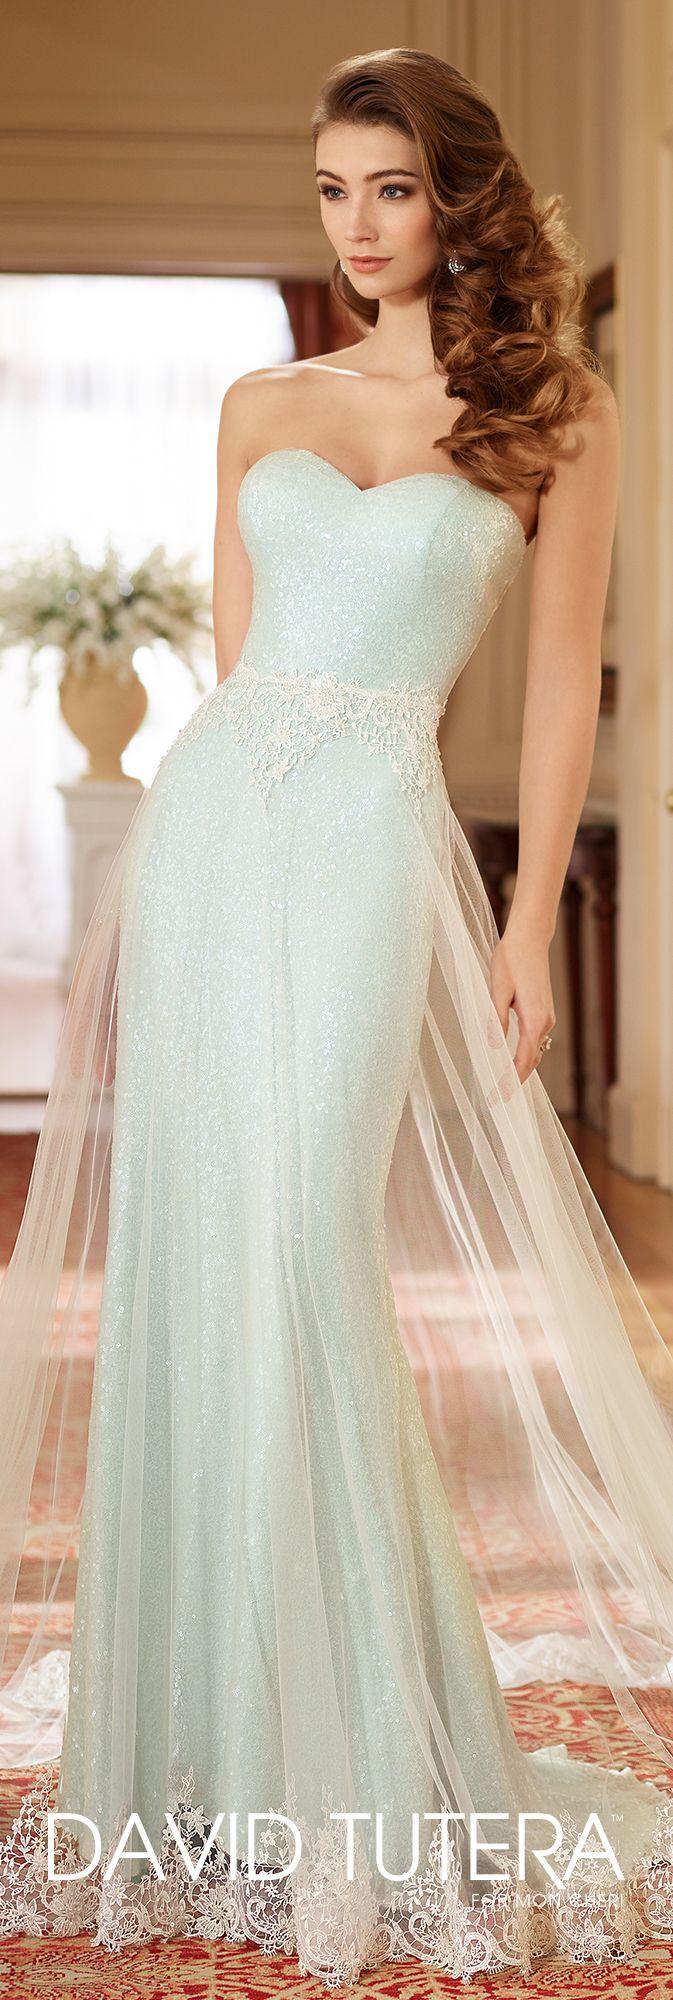 Sequin Tulle Wedding Dress with Detachable Skirt- 217214 Lillian ...